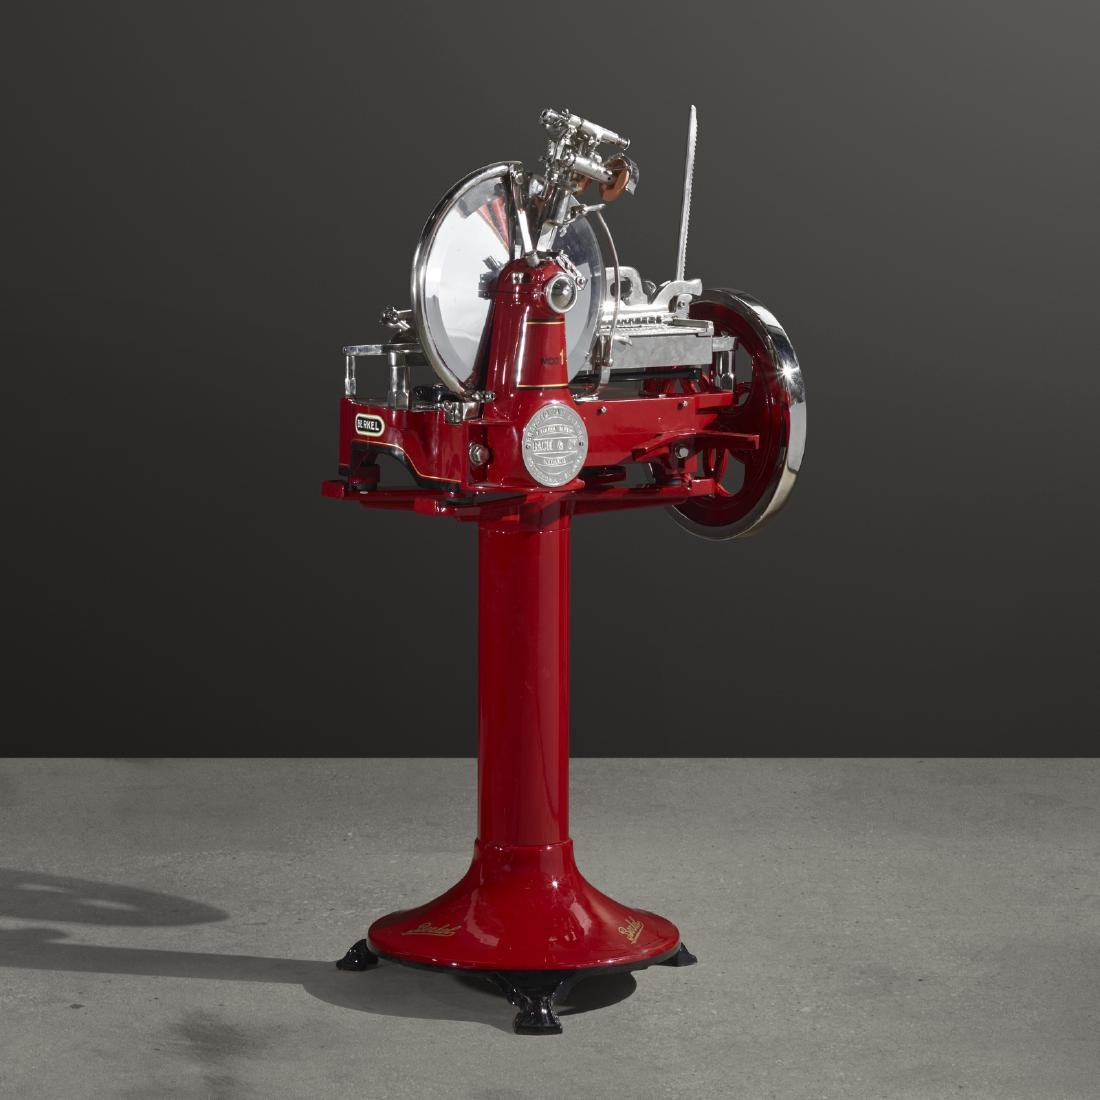 Berkel, Flywheel slicer, model 1